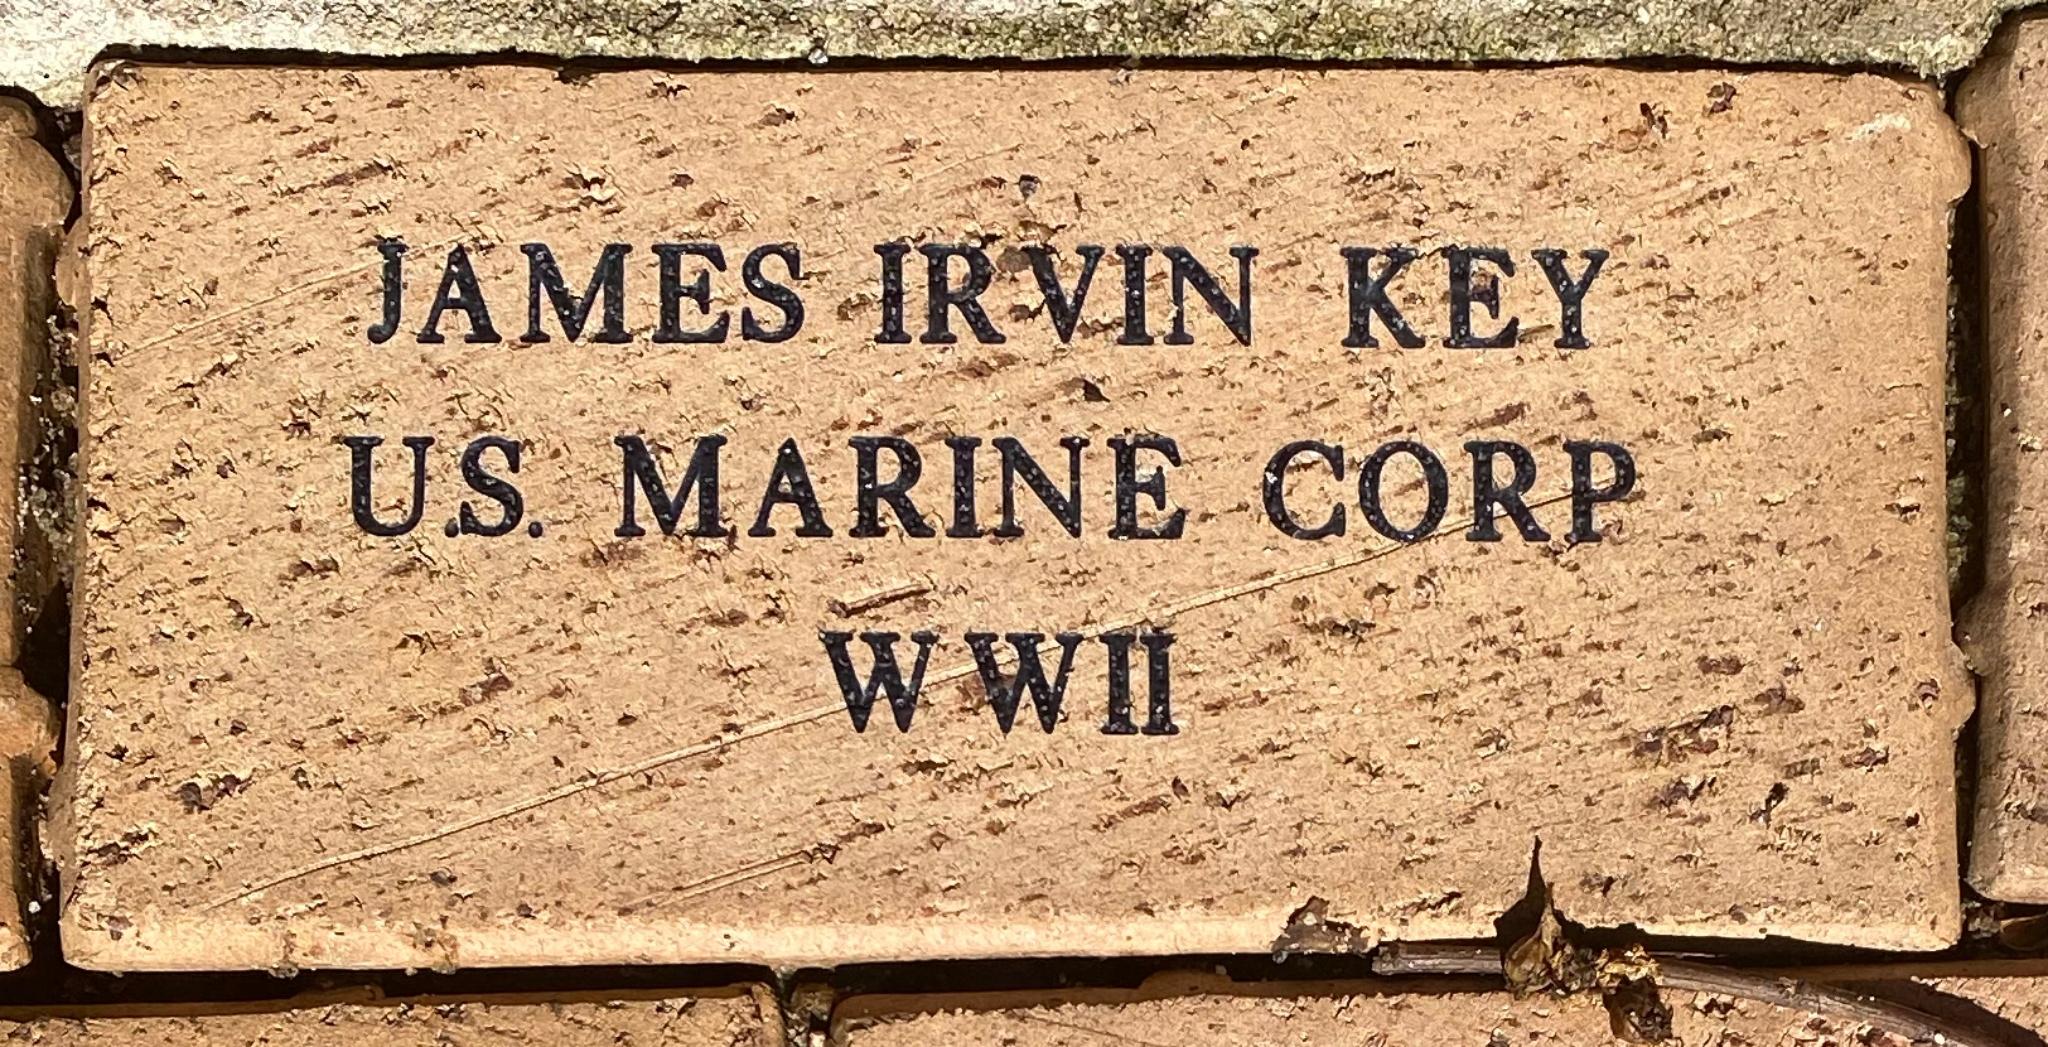 JAMES IRVIN KEY U.S. MARINE CORP WWII